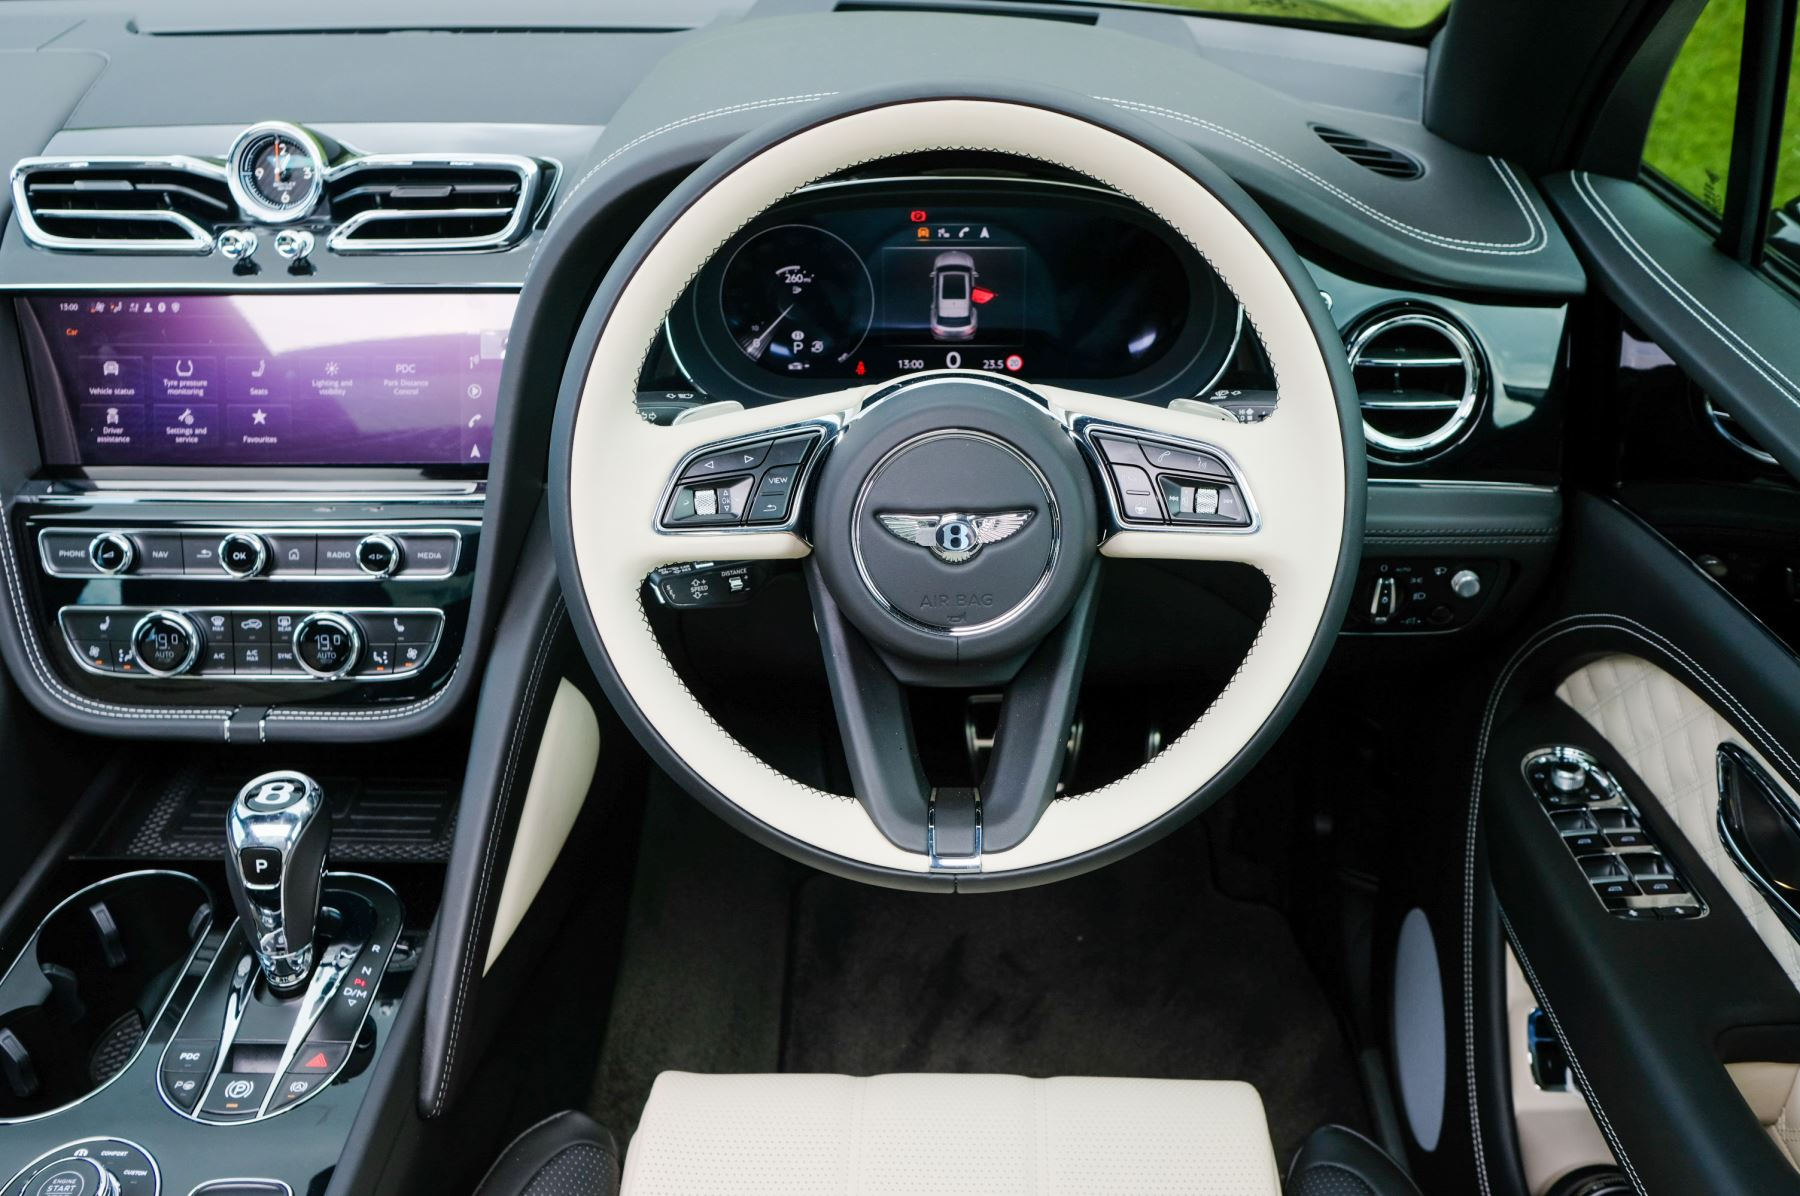 Bentley Bentayga 4.0 V8 - Mulliner Driving Specification for Black Specification image 16